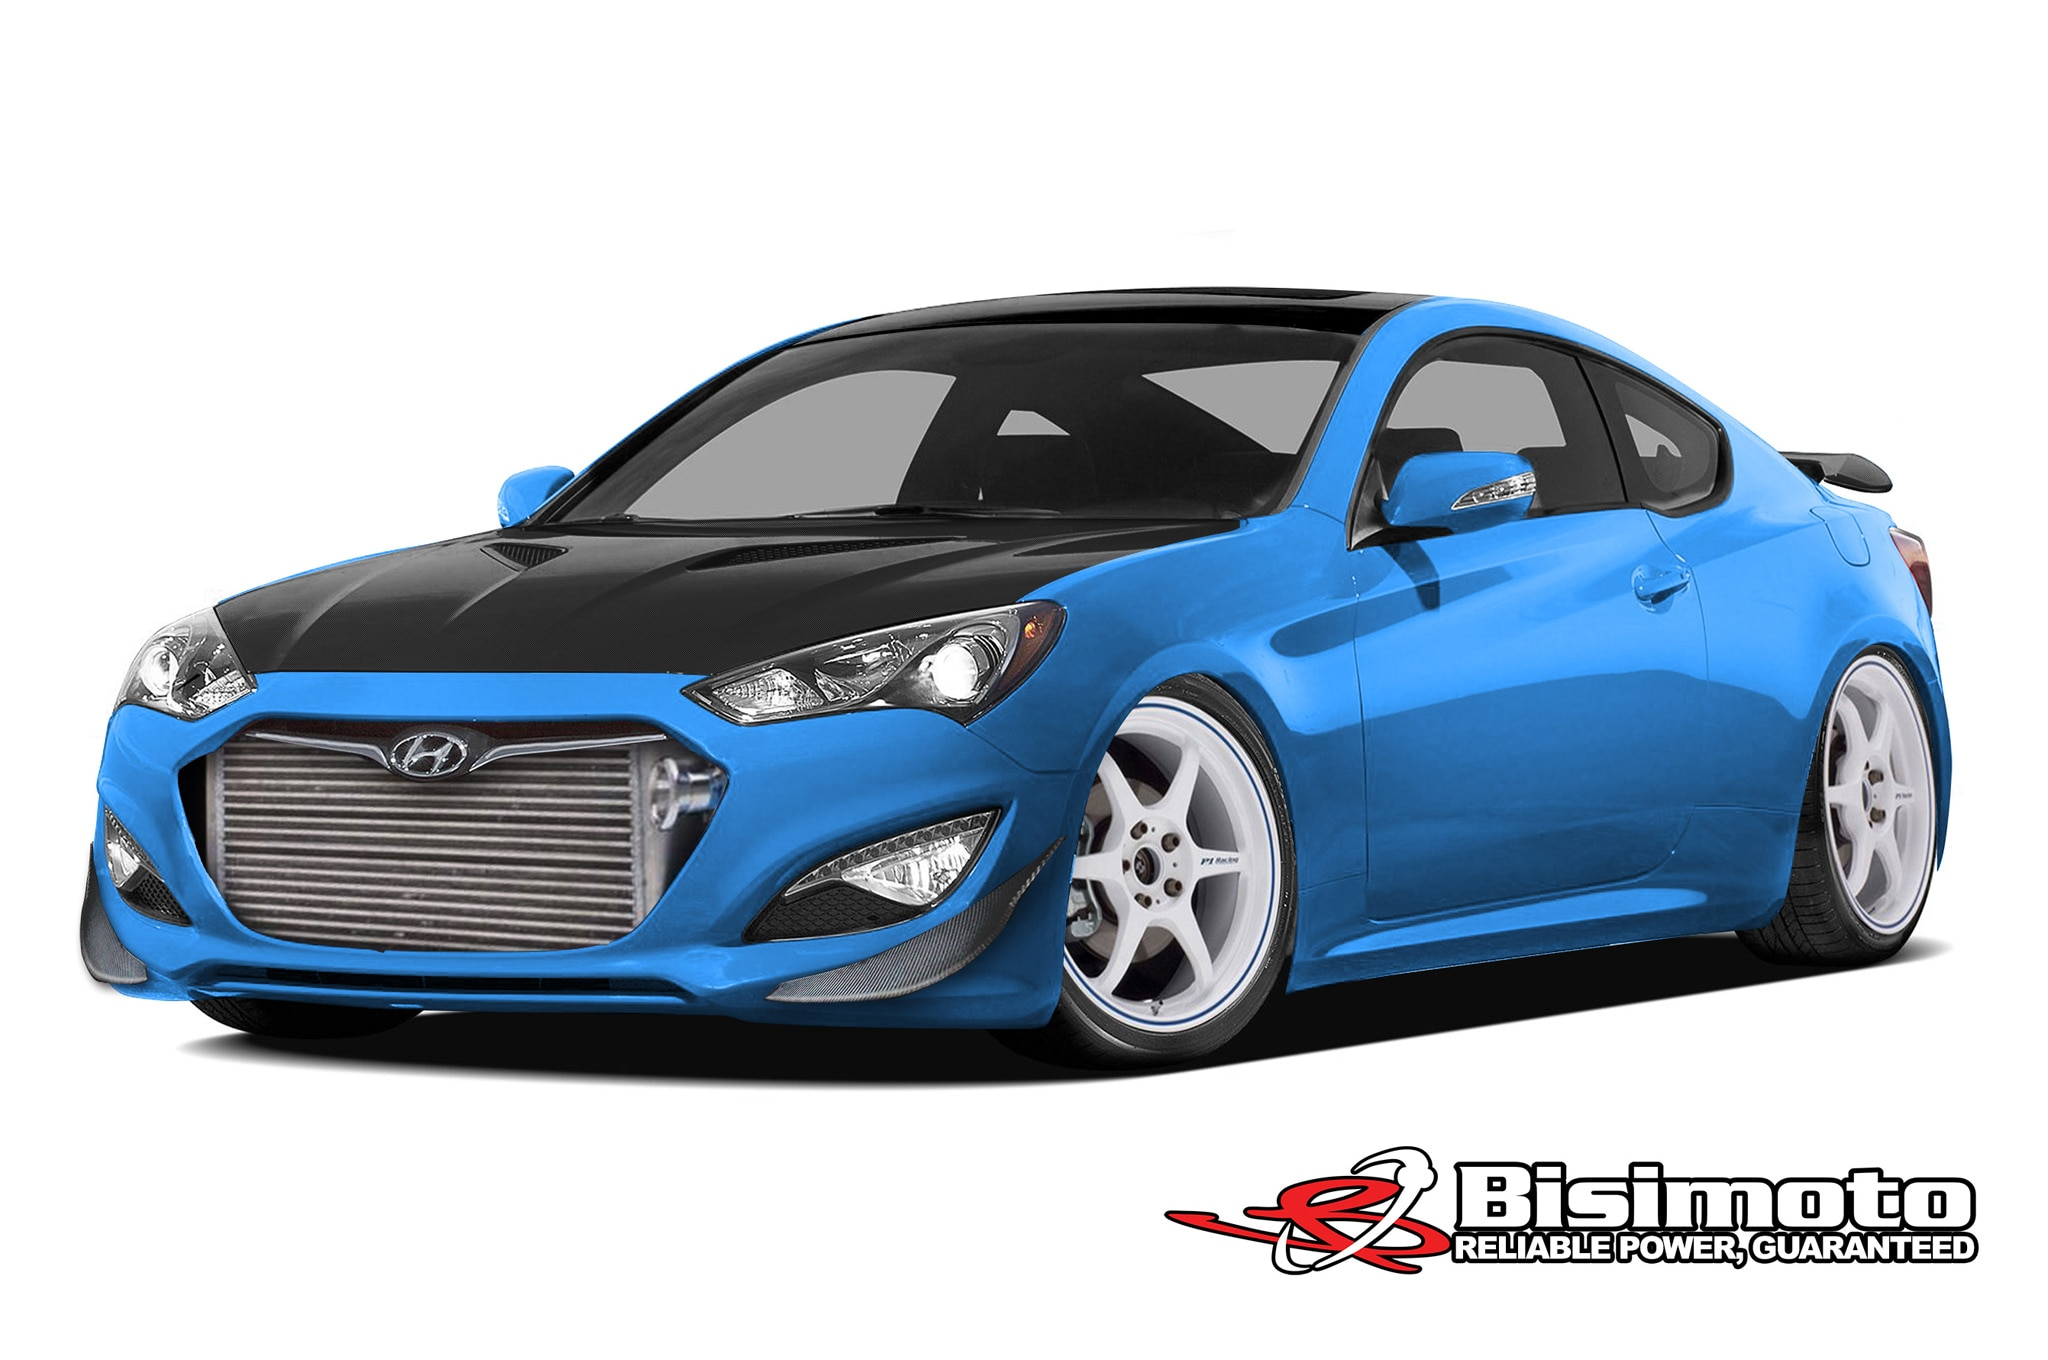 2013 Hyundai Genesis Coupe By Bisimoto Engineering Front Three Quarter1